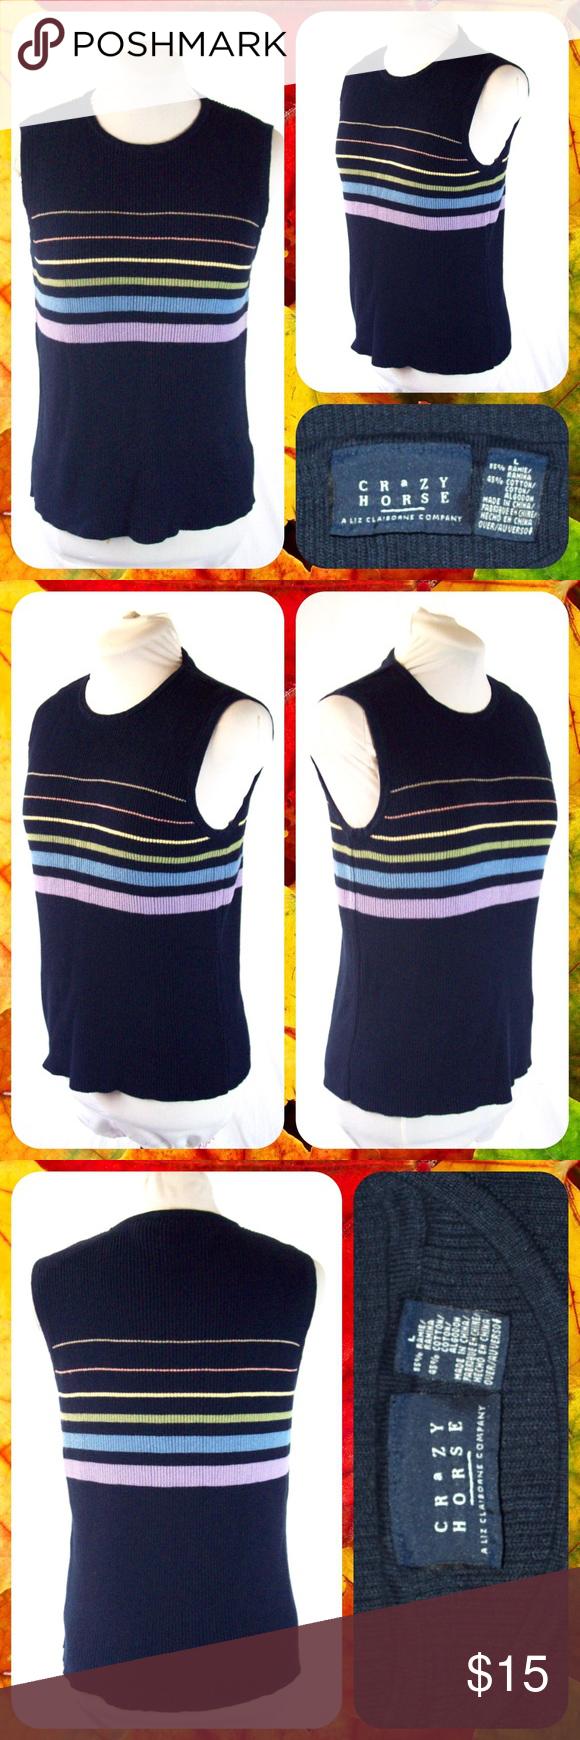 Striped Navy Blue Knit Sweater Vest Top Size L Crazy Horse/ Liz ...